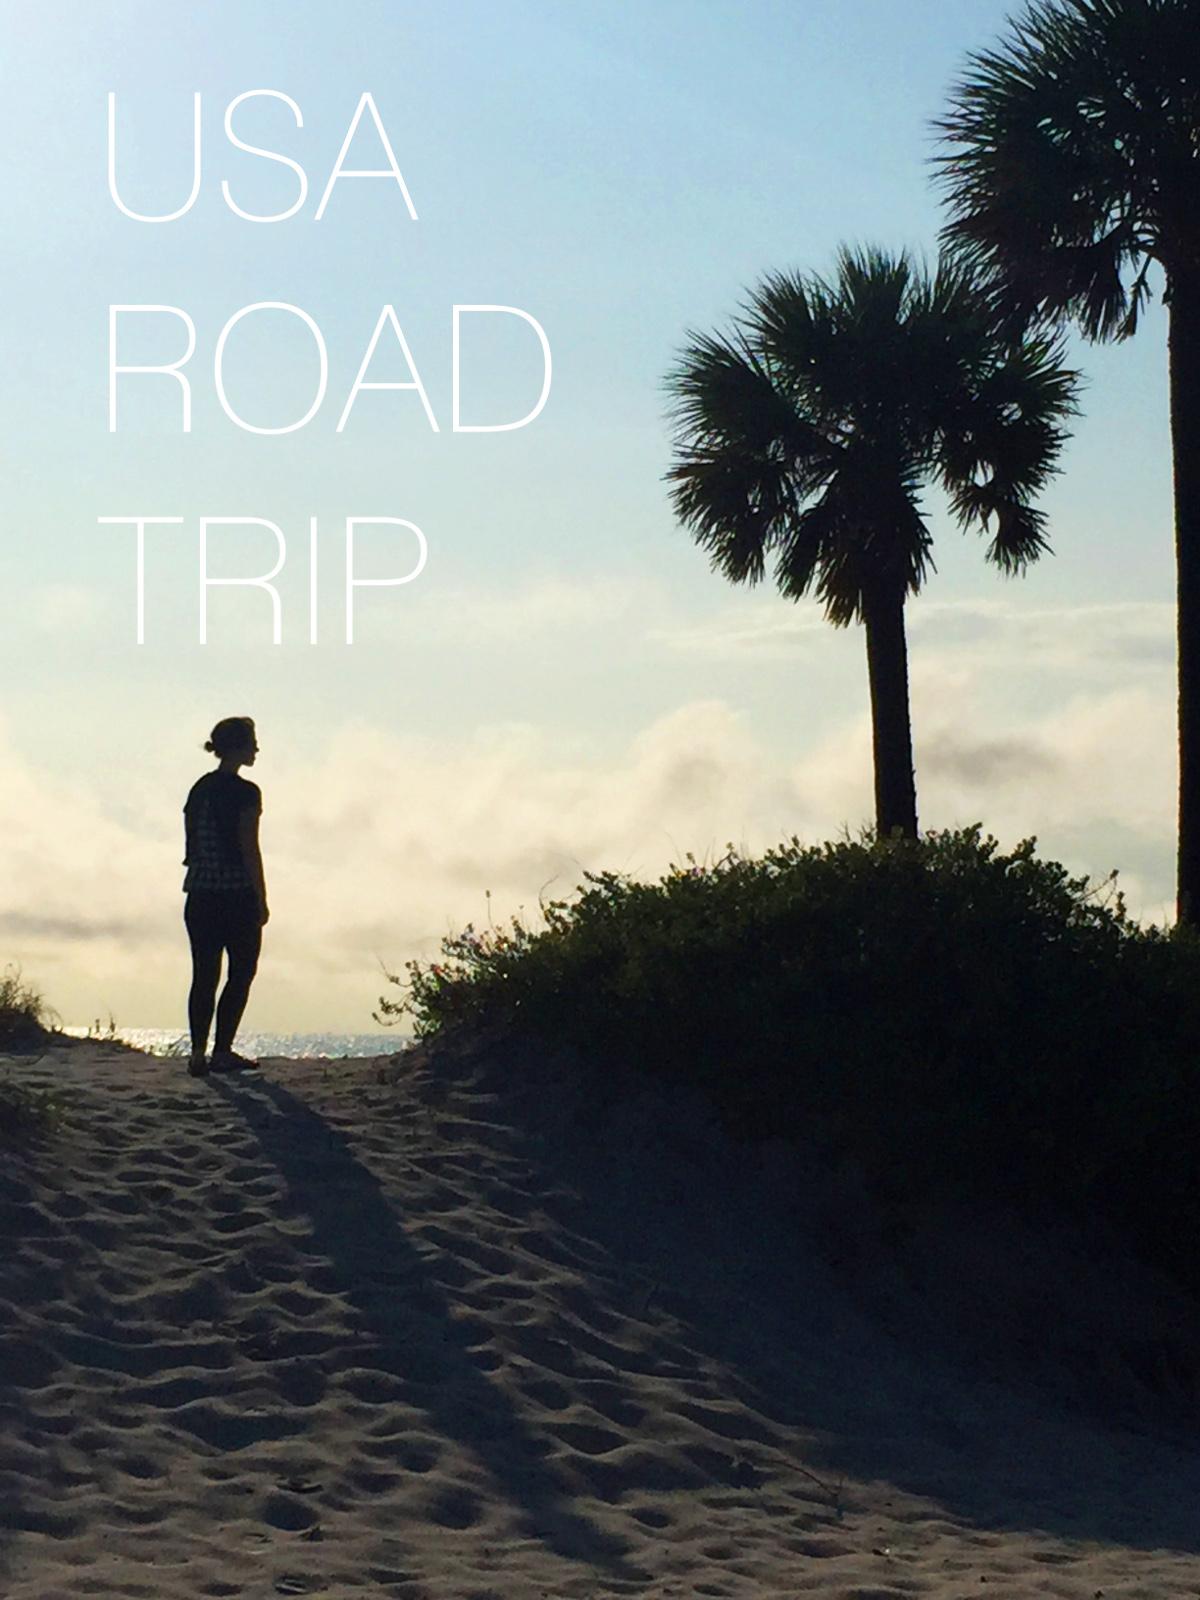 USA Road Trip Tipps